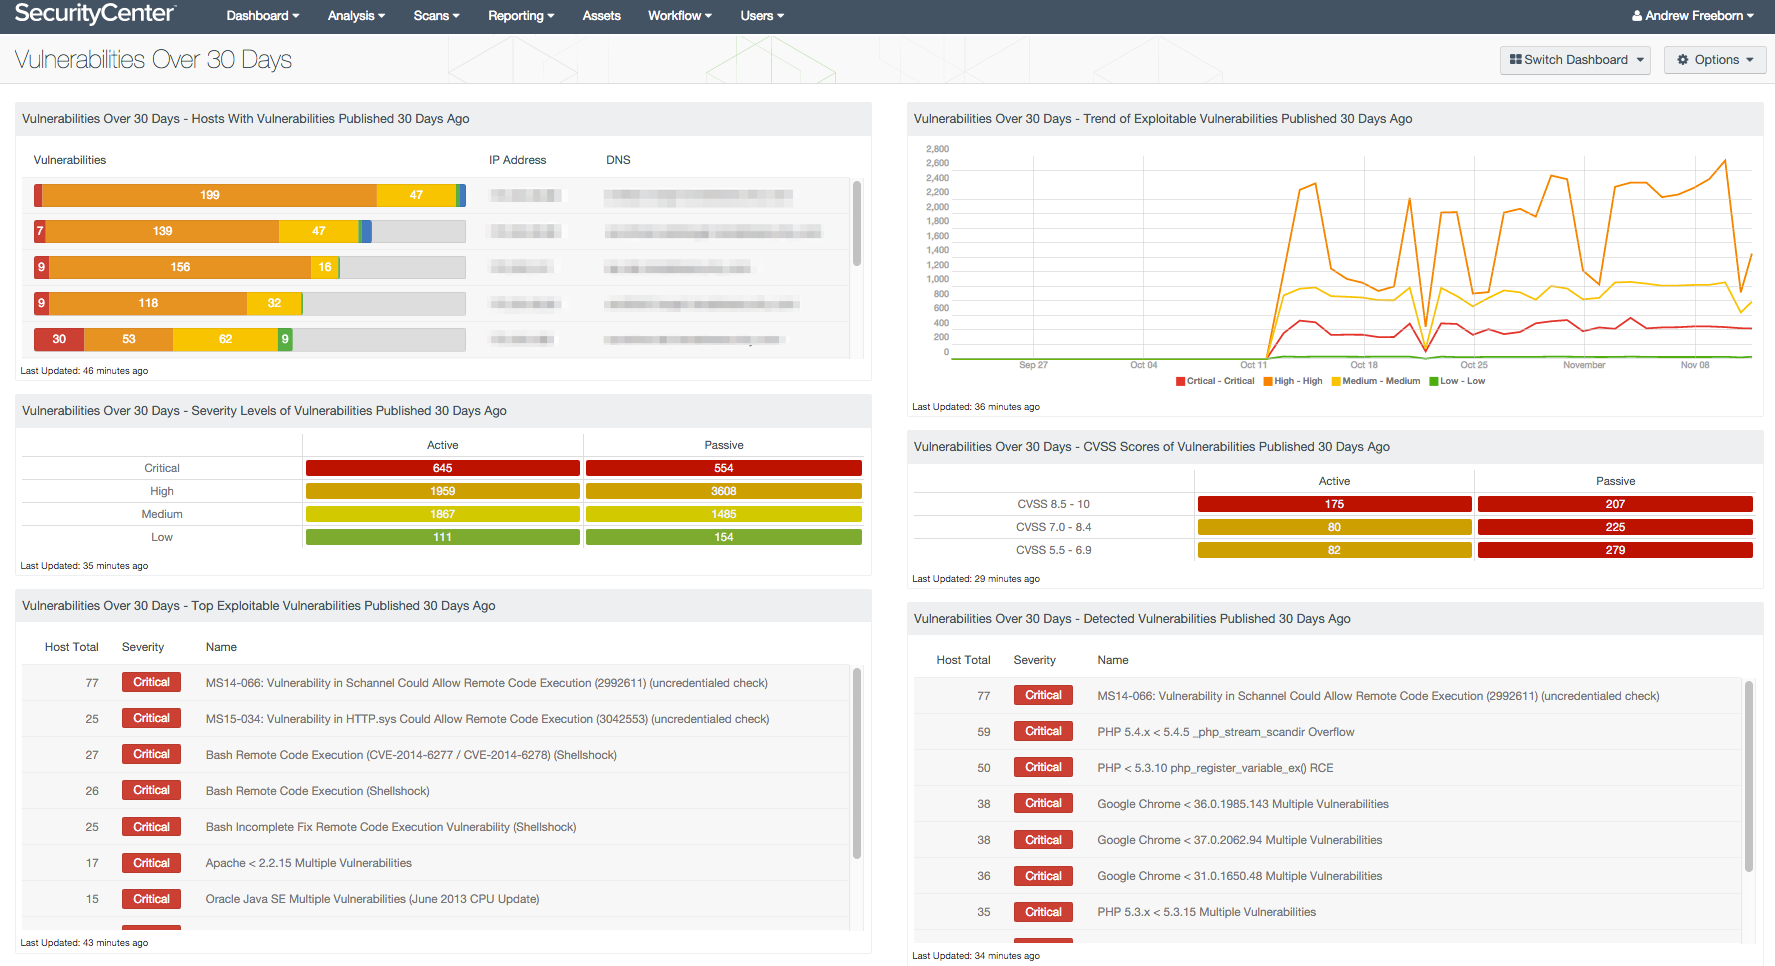 Vulnerabilities Over 30 Days Dashboard